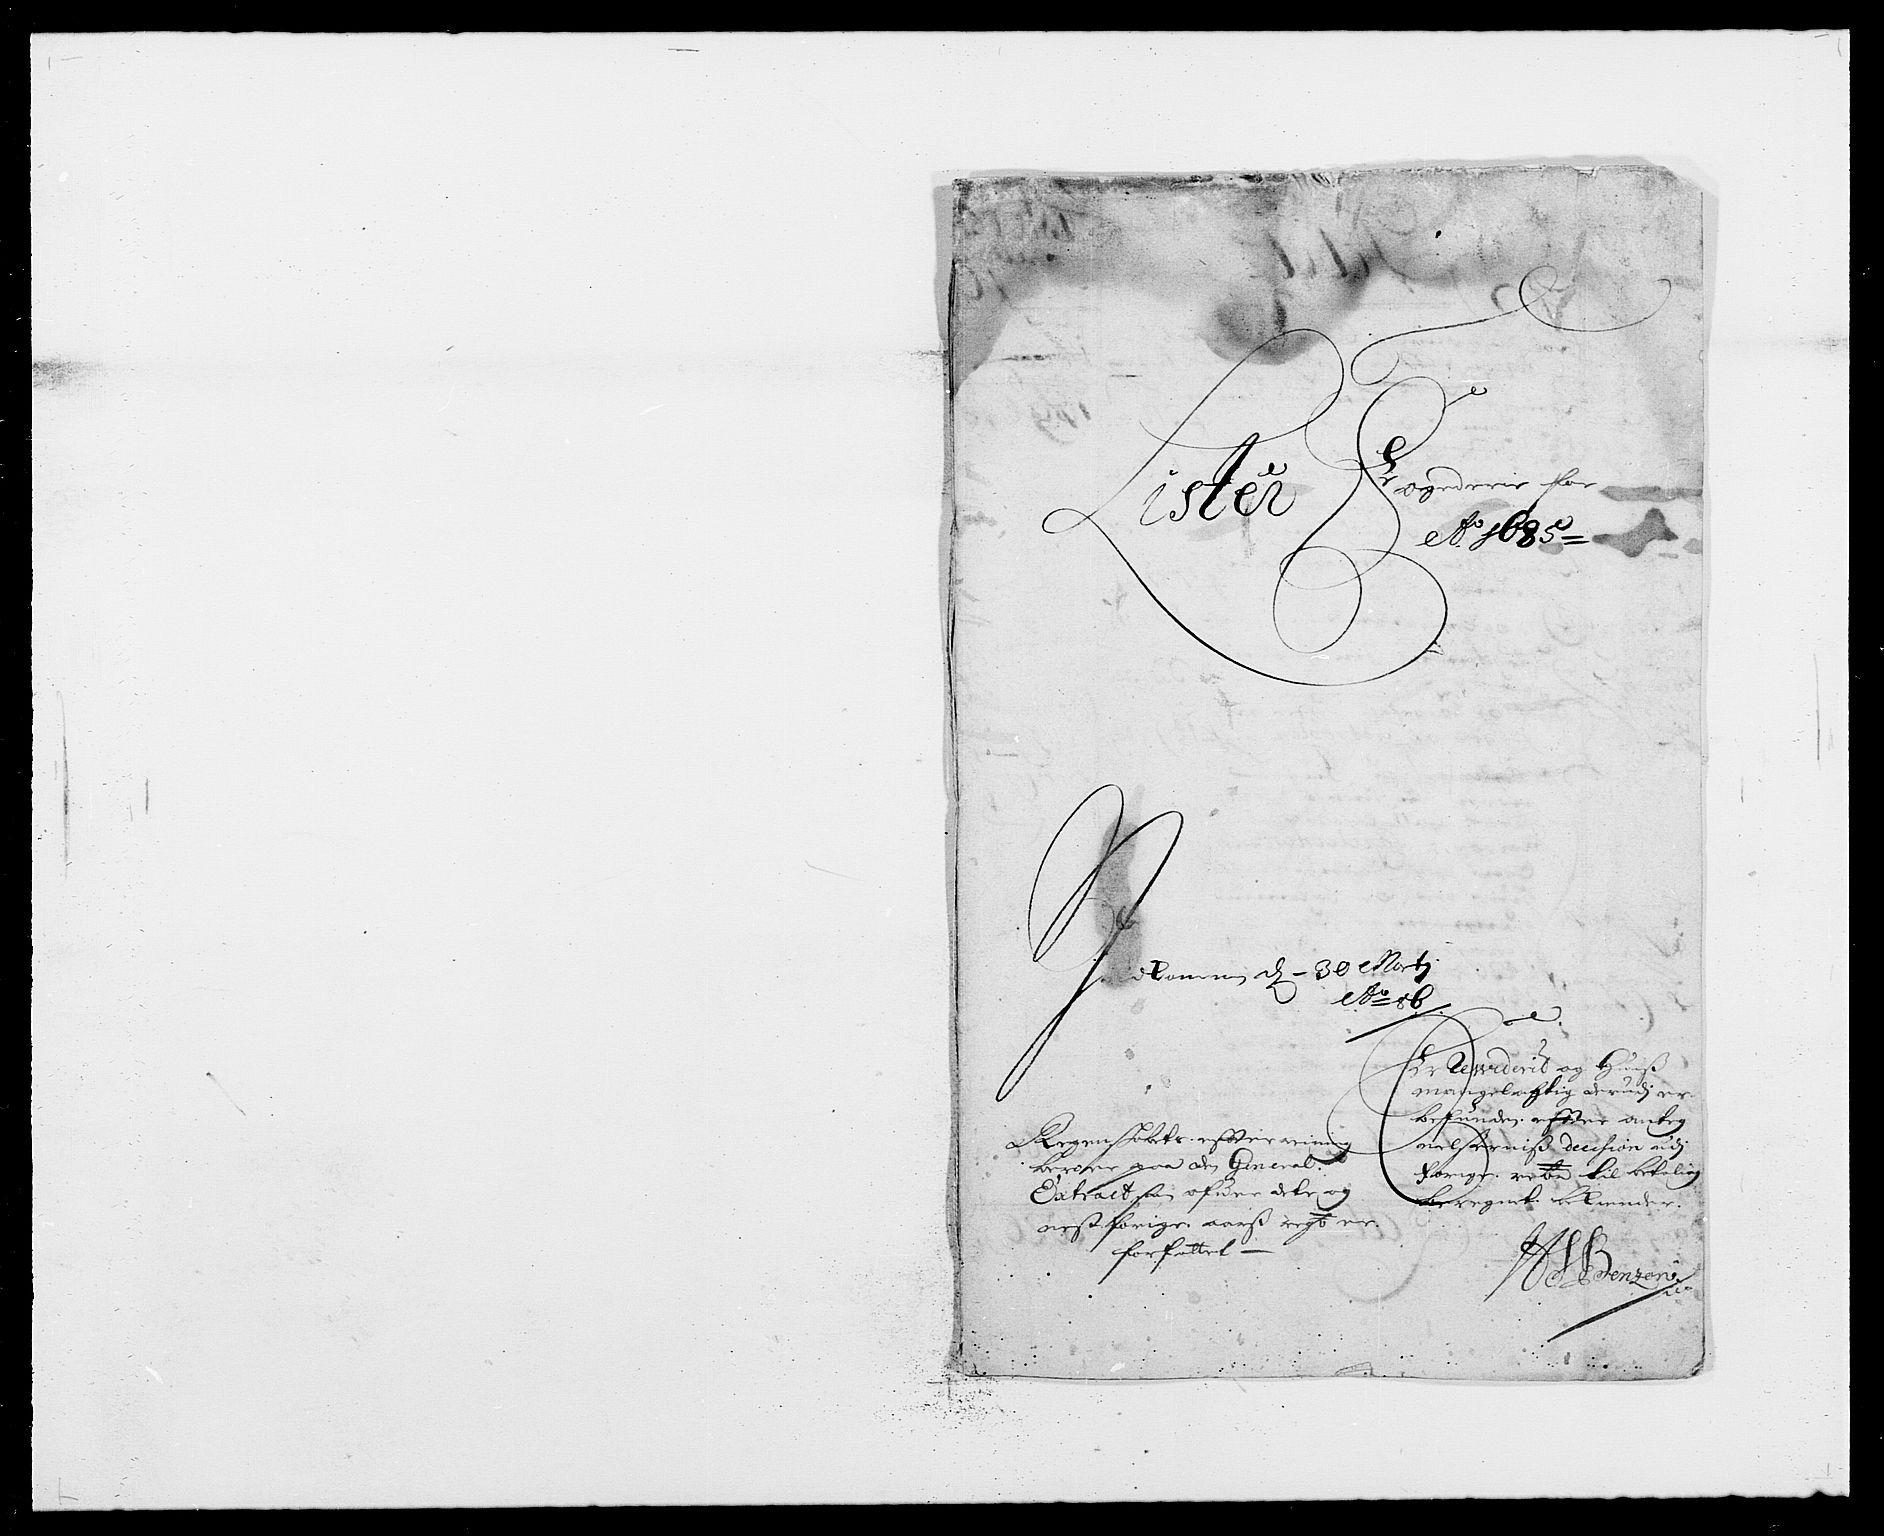 RA, Rentekammeret inntil 1814, Reviderte regnskaper, Fogderegnskap, R41/L2533: Fogderegnskap Lista, 1684-1685, s. 155